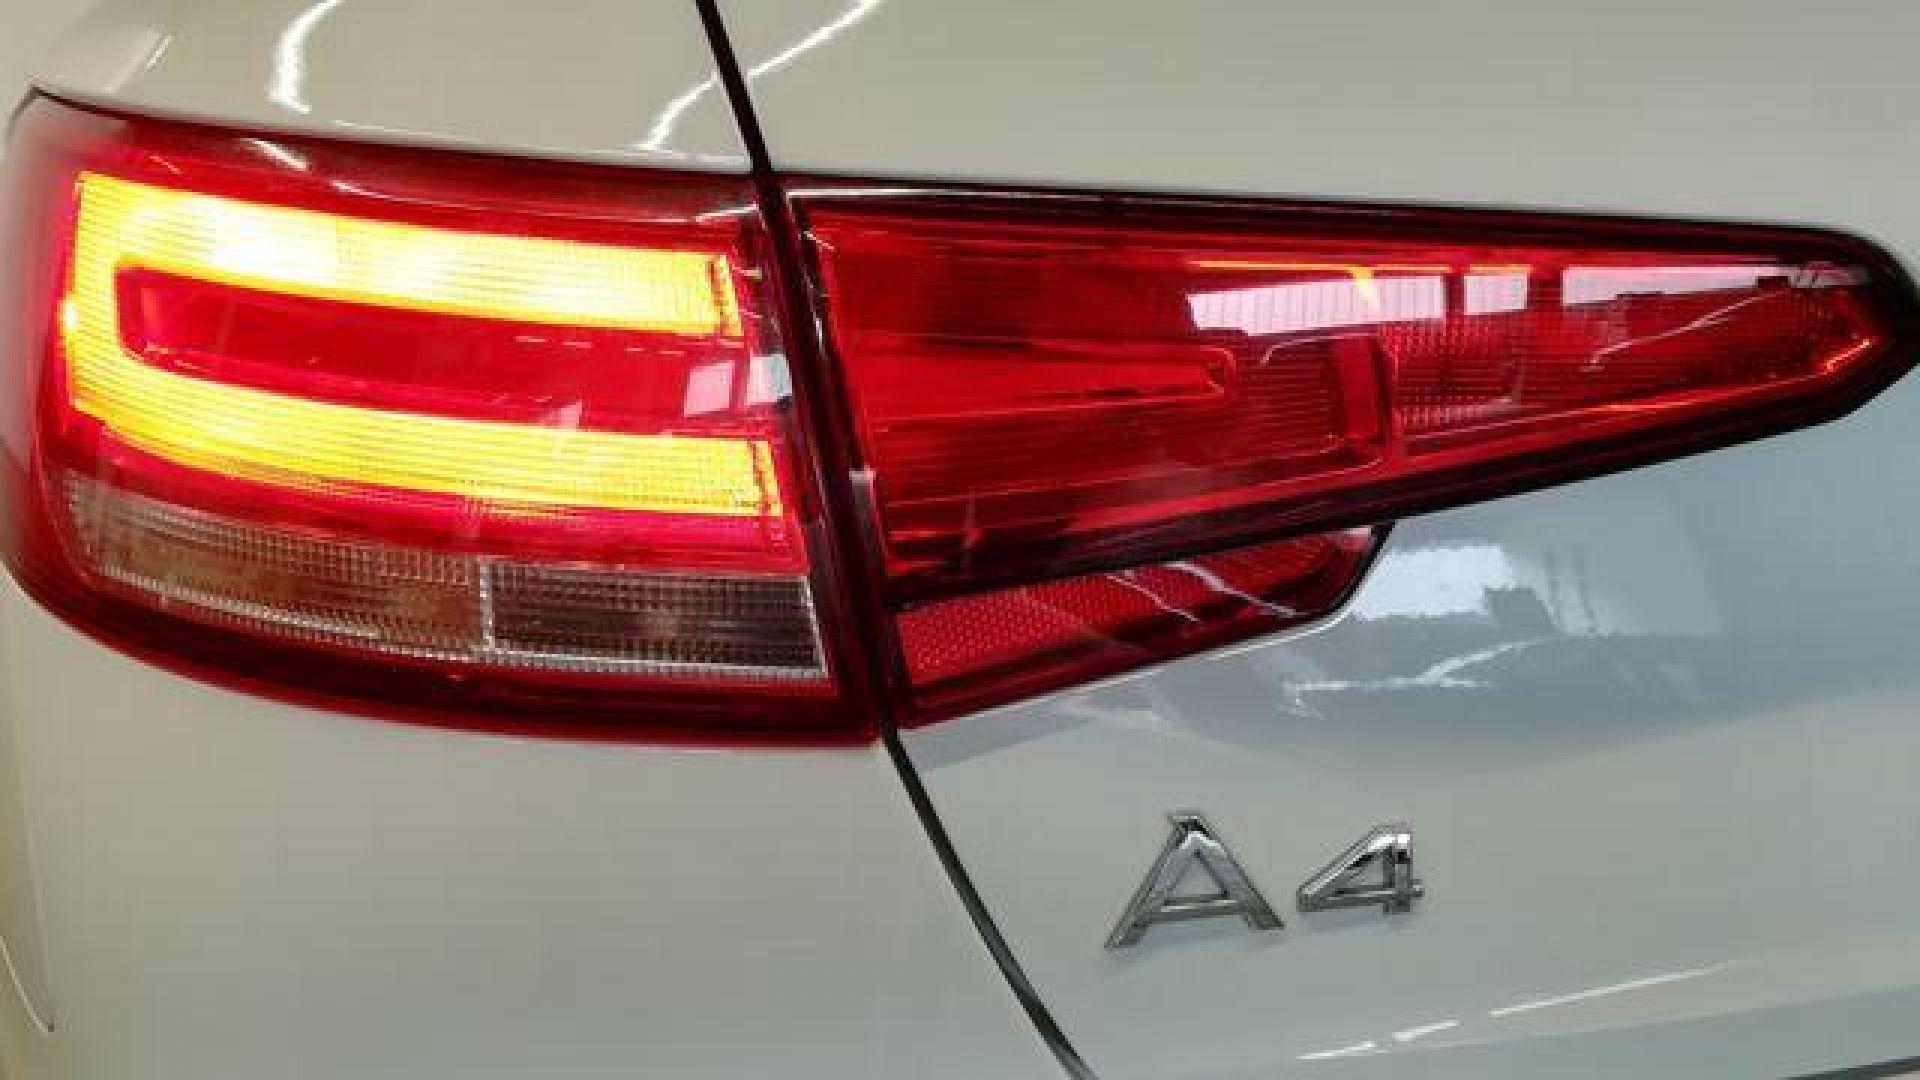 Audi A4 Avant 2.0 TDI ultra S tronic design edit